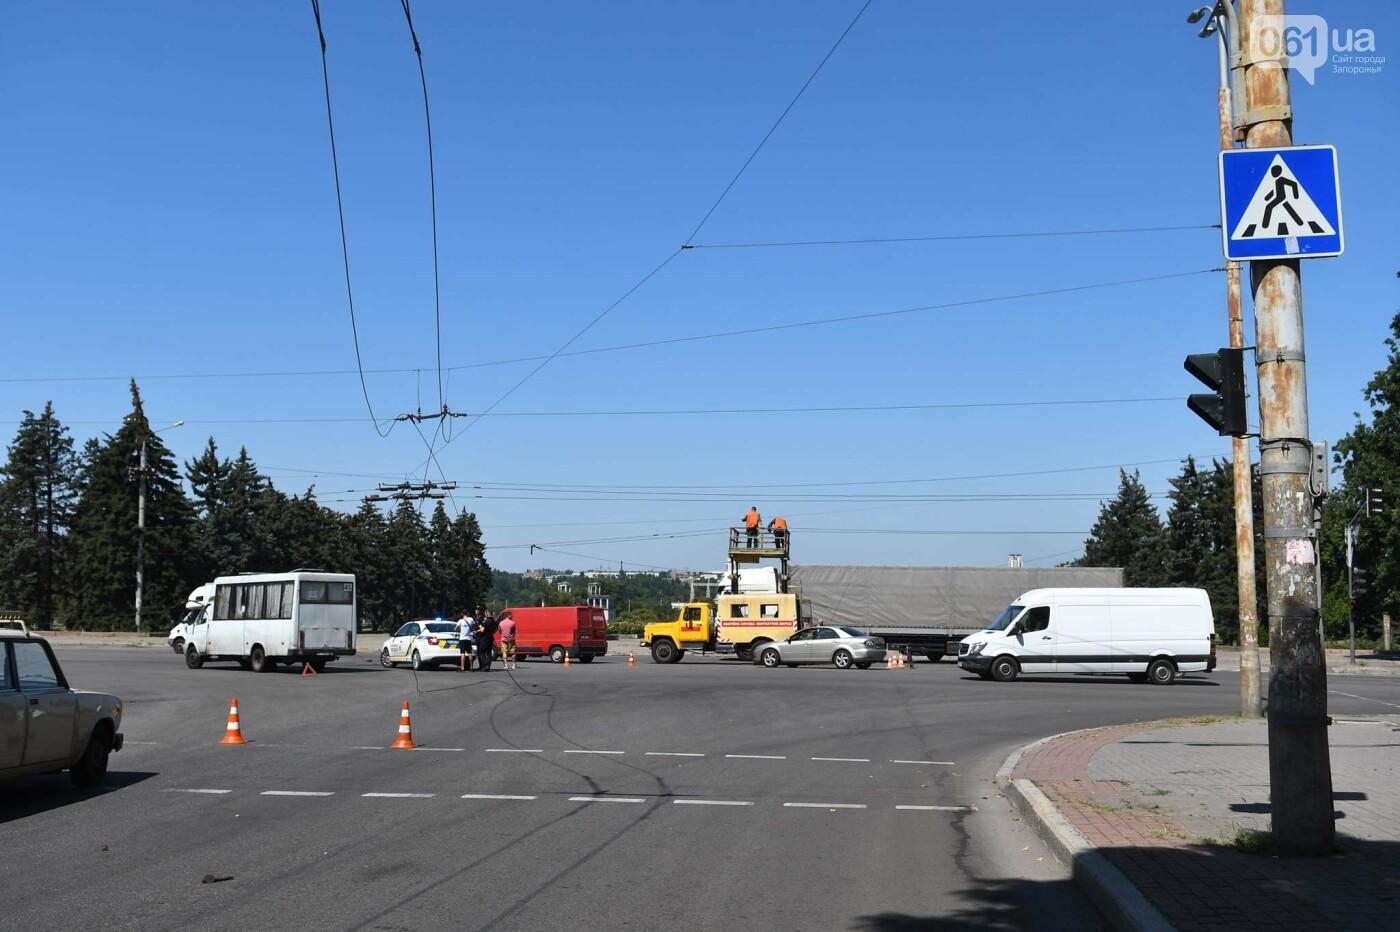 В Запорожье фура оборвала троллеи - провода упали на маршрутку, - ФОТО, фото-2